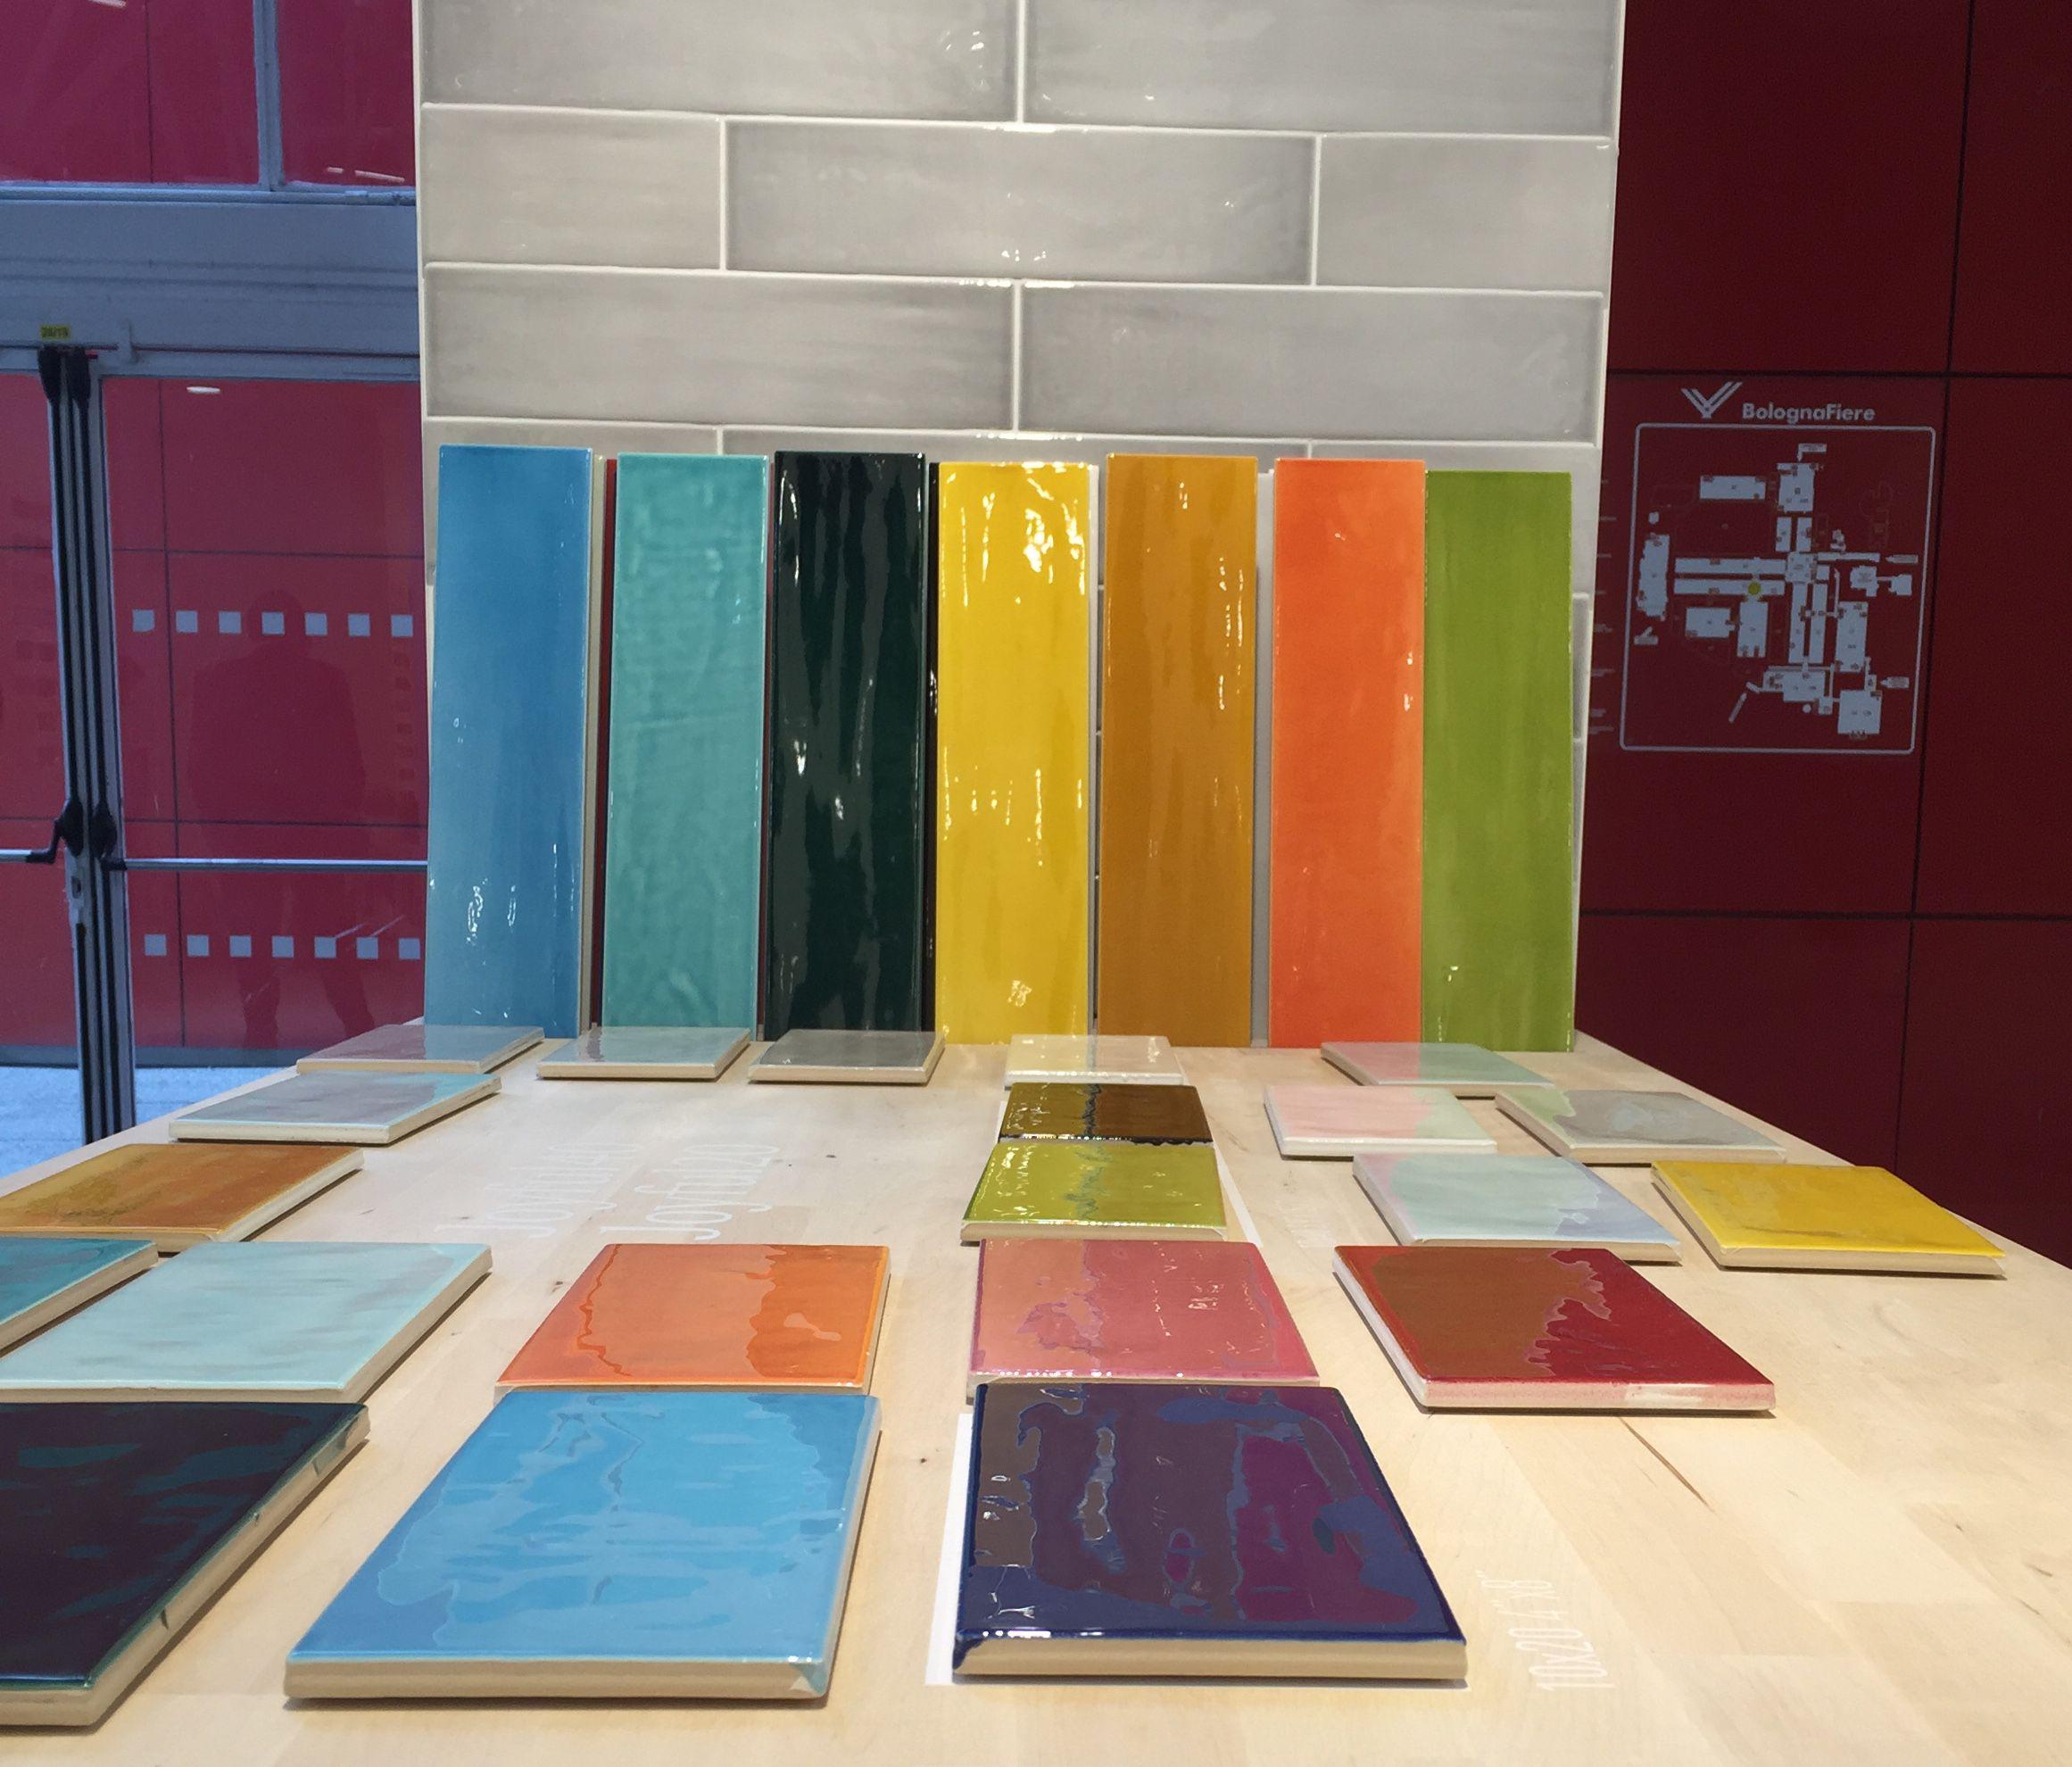 Tonalite collezione Joyful 40, 10x40 e Joyful 20, 10x20, colori ...